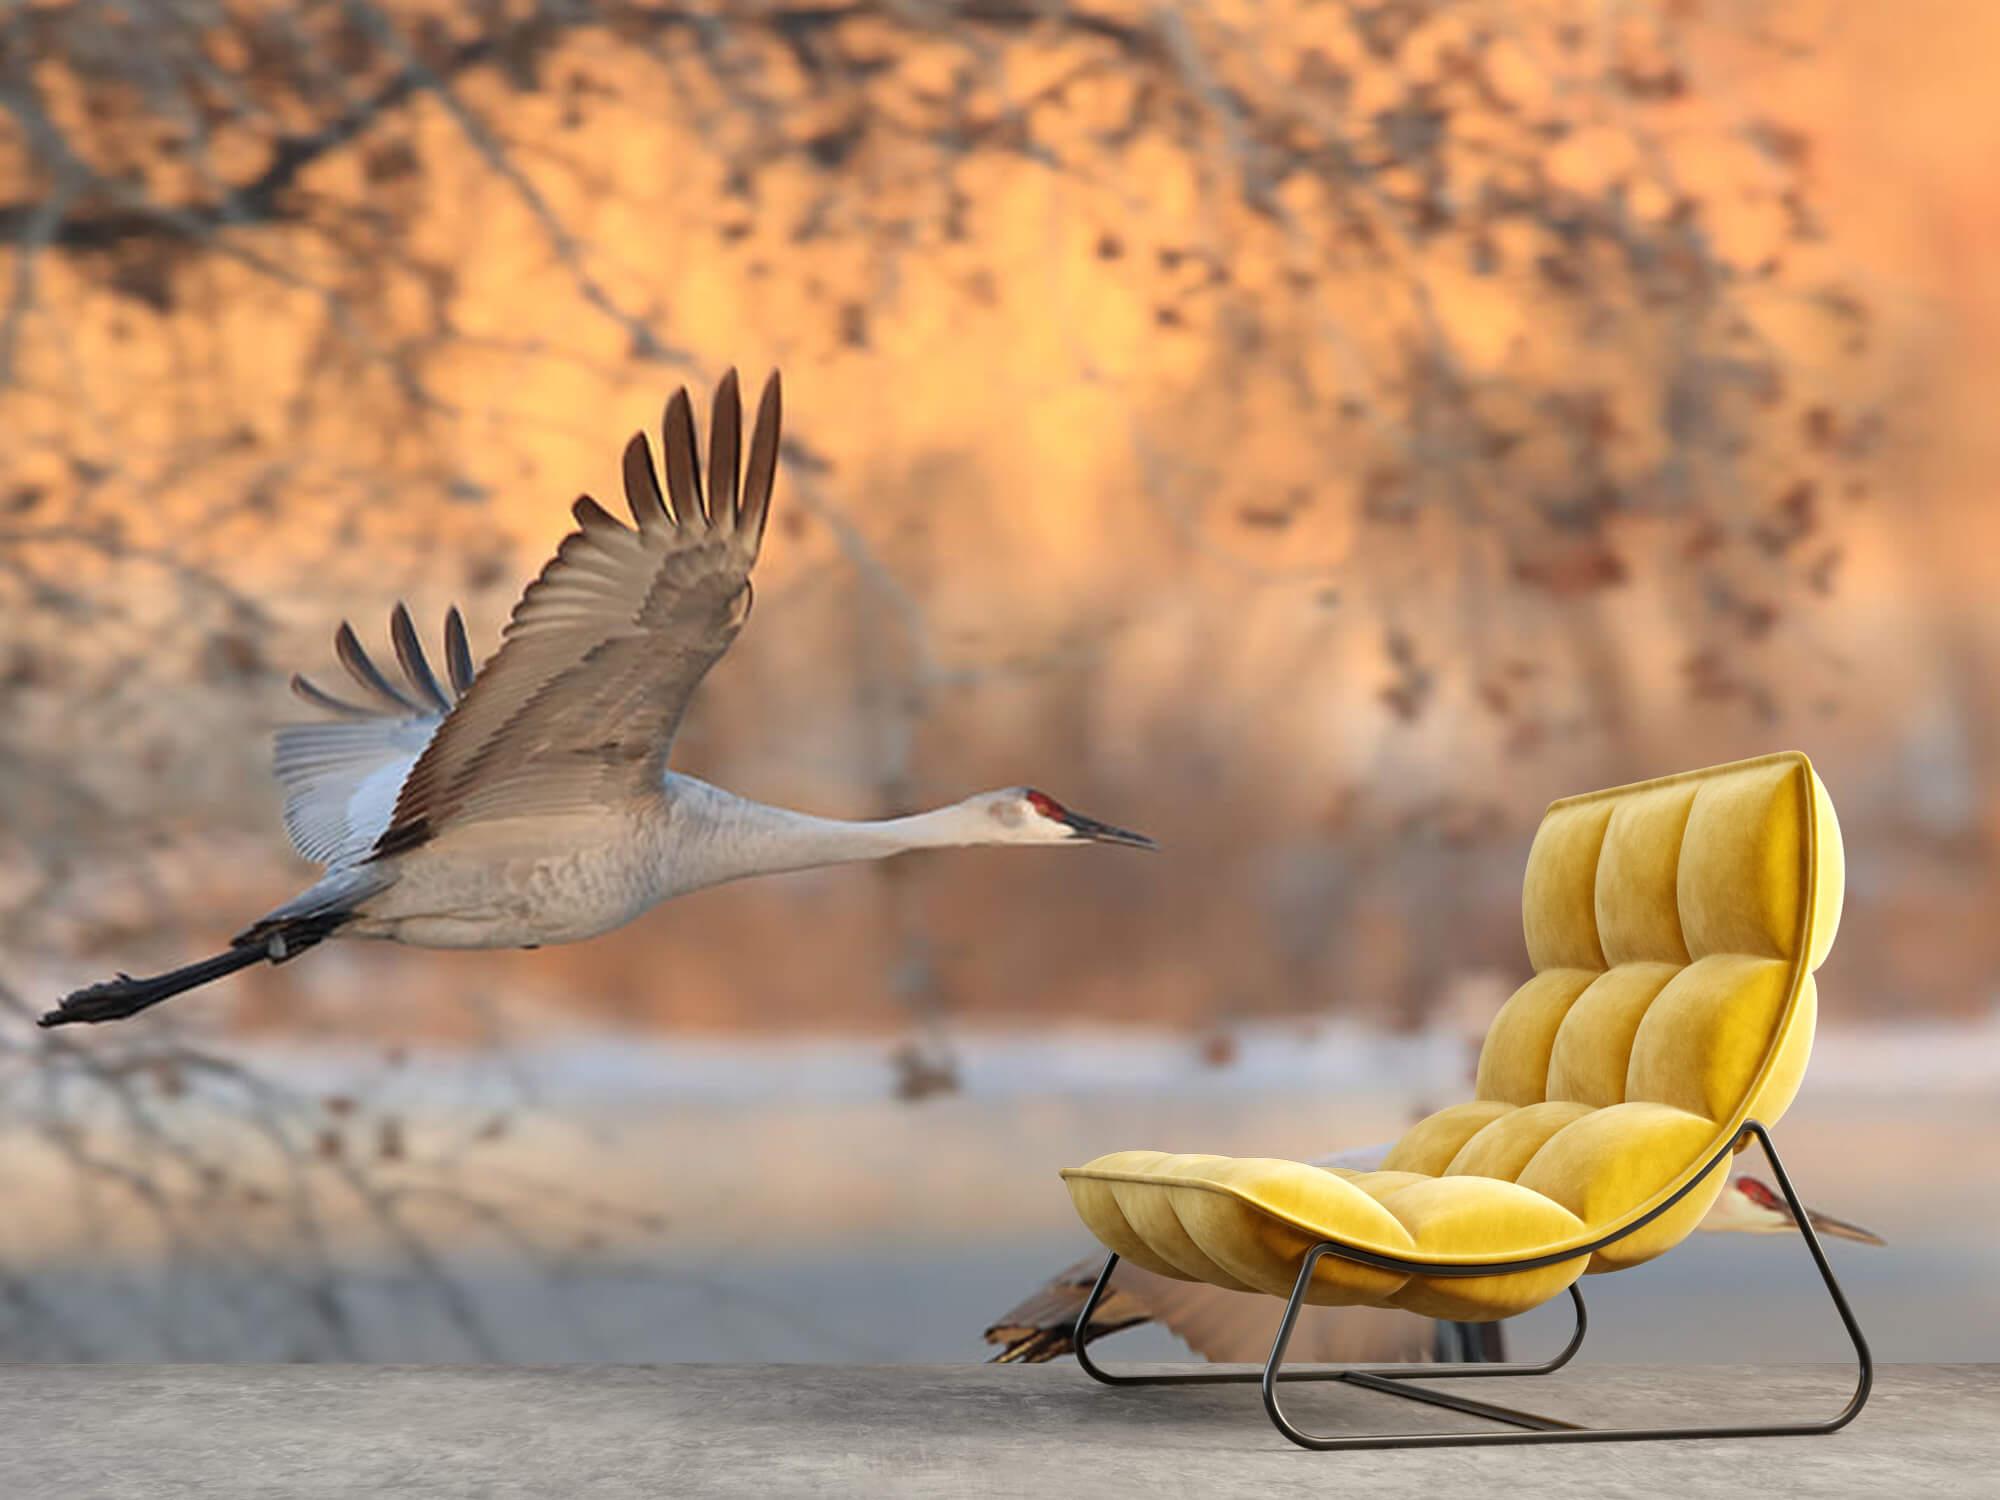 Vliegende kraanvogels 3